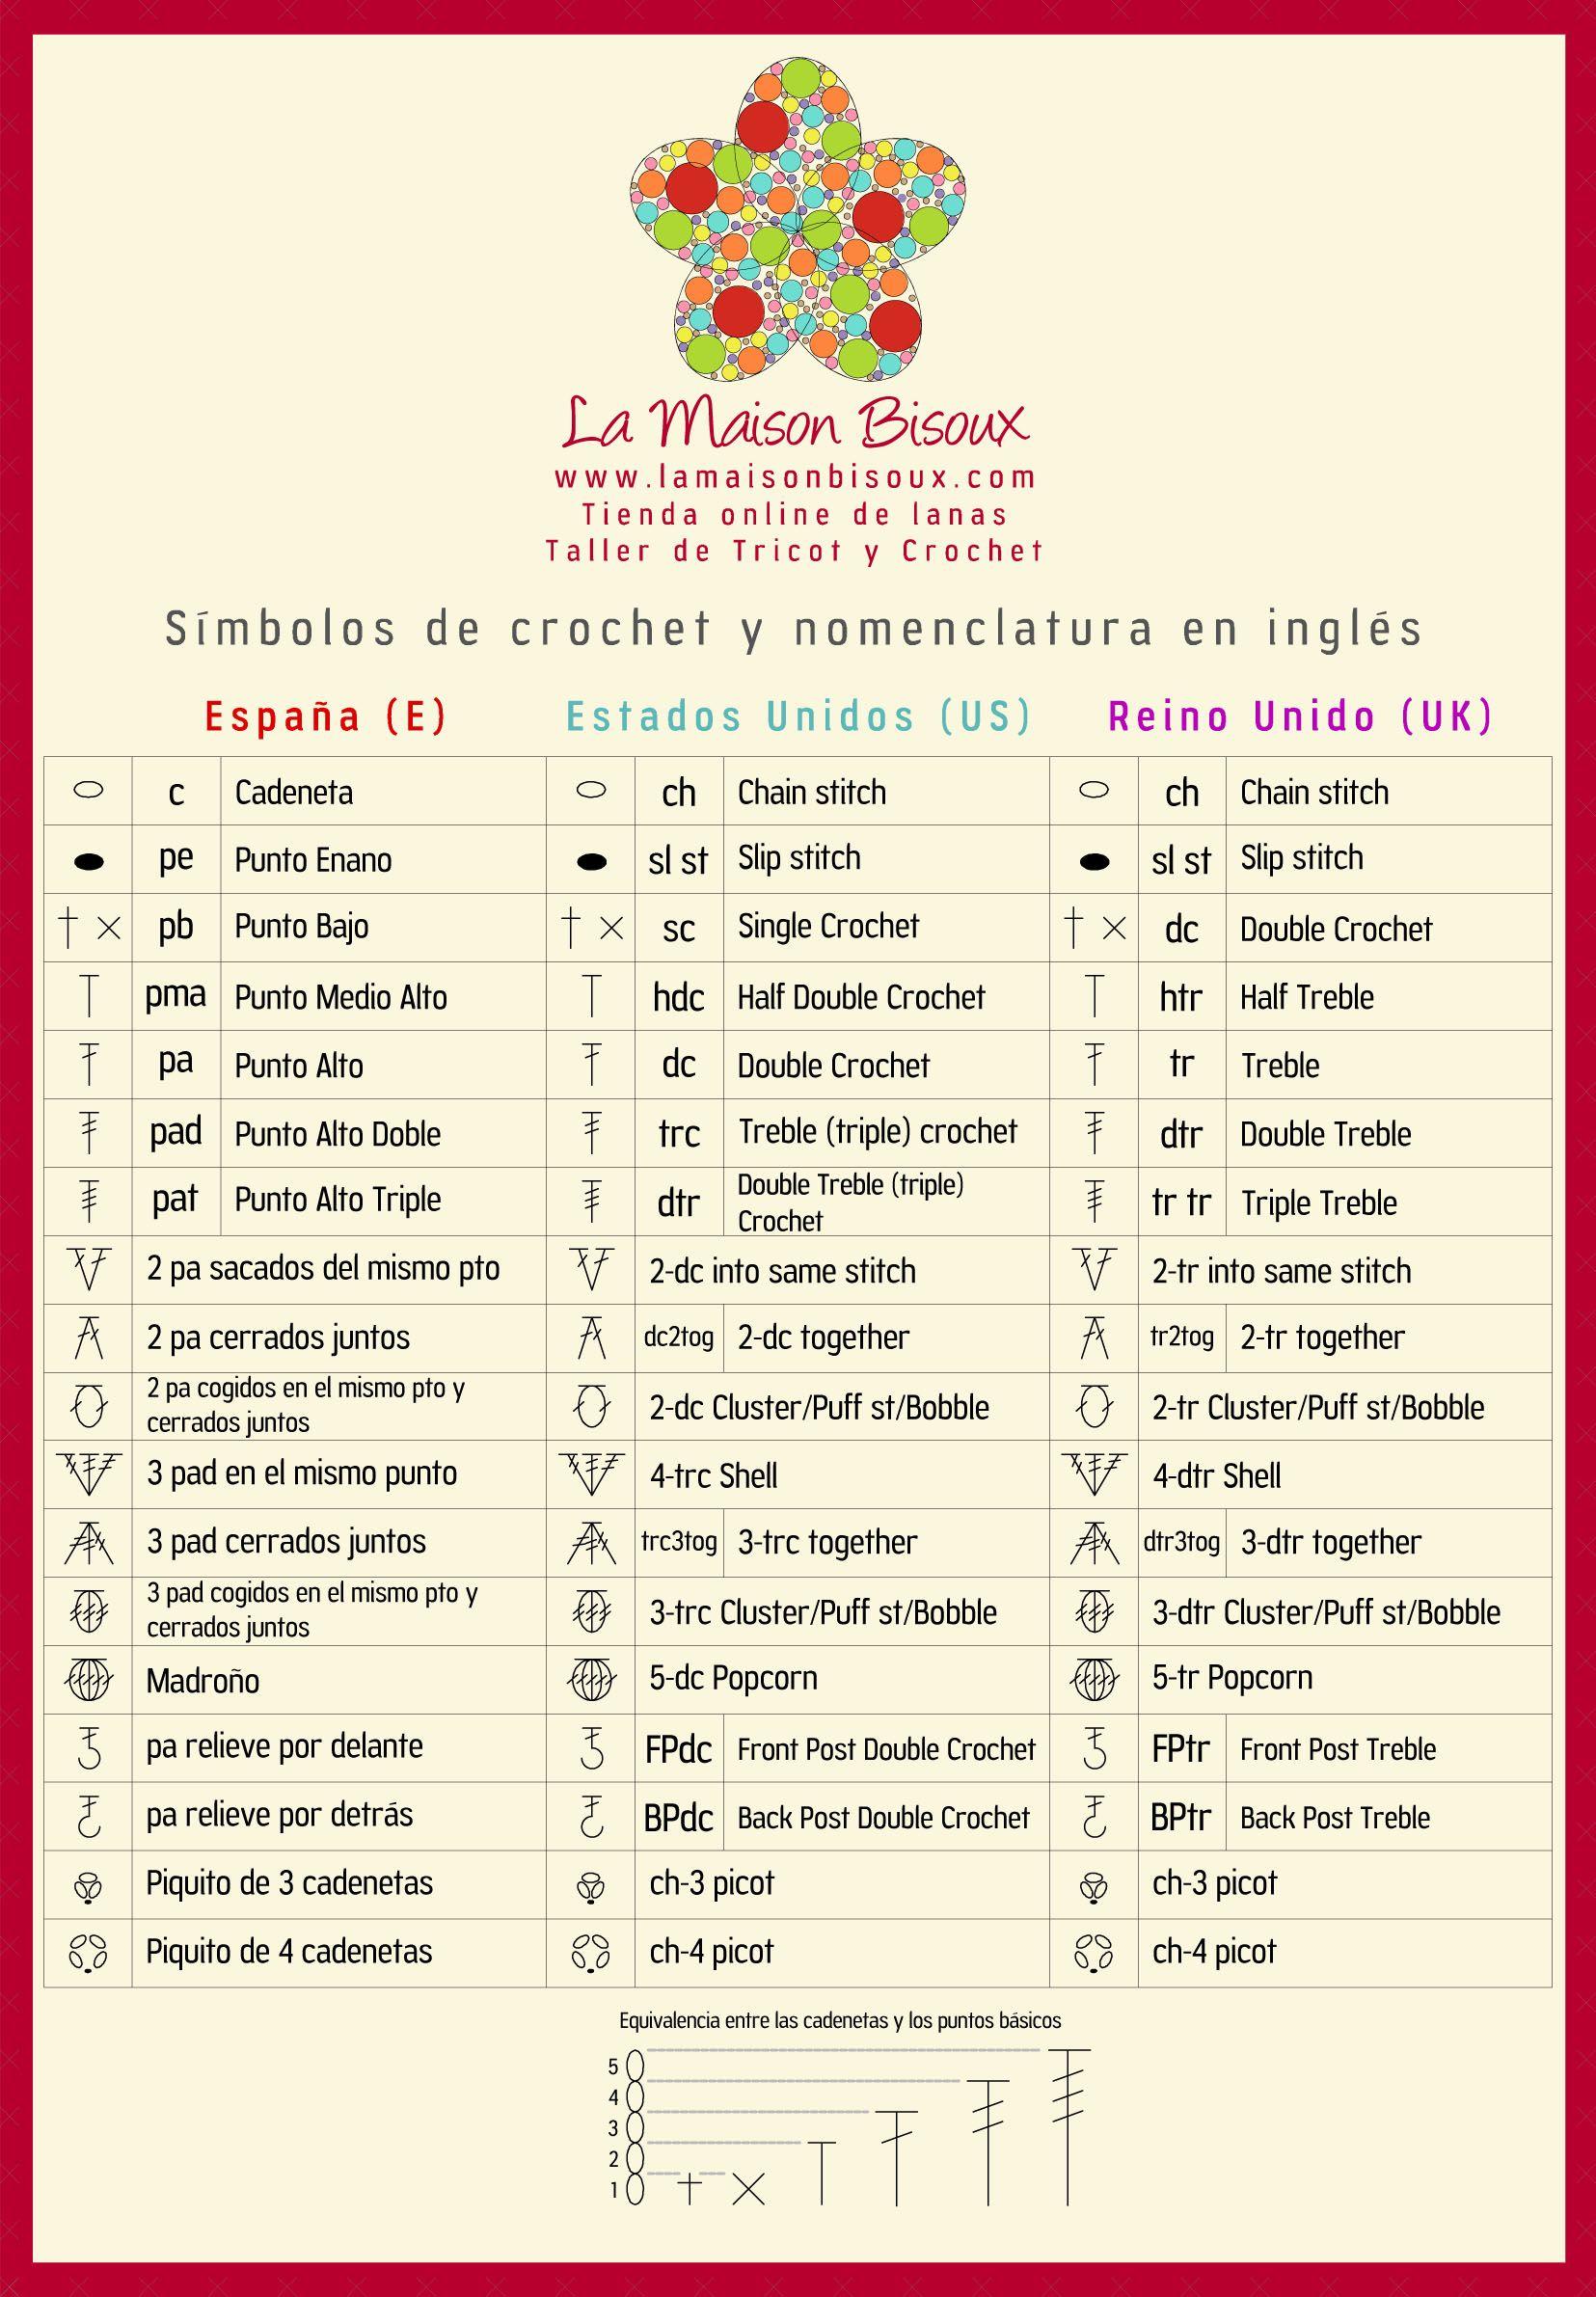 Símbolos de ganchillo y nomenclatura en español e inglés | Crochet ...